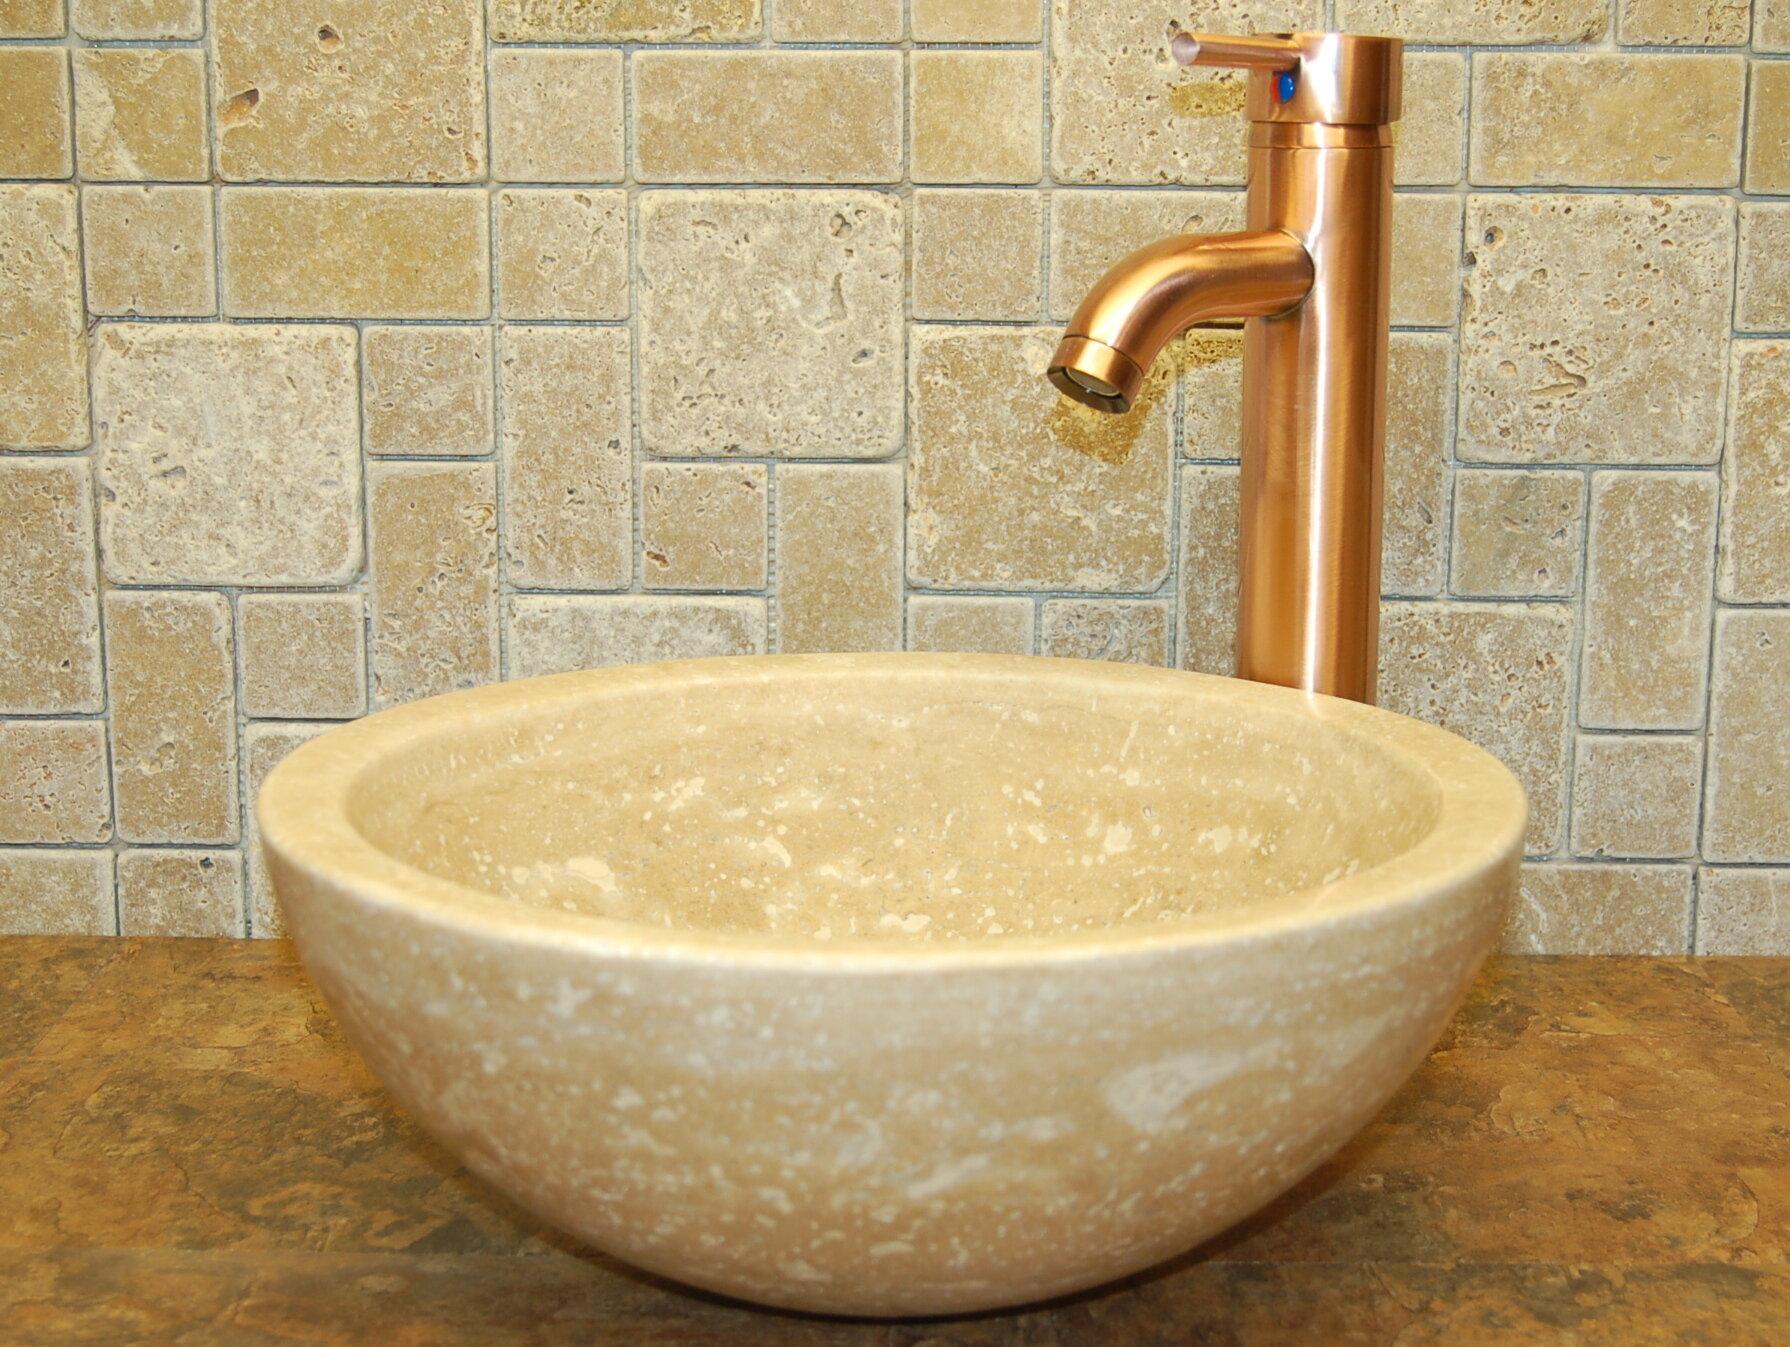 Merveilleux Small Bowl Honed Travertine Circular Vessel Bathroom Sink